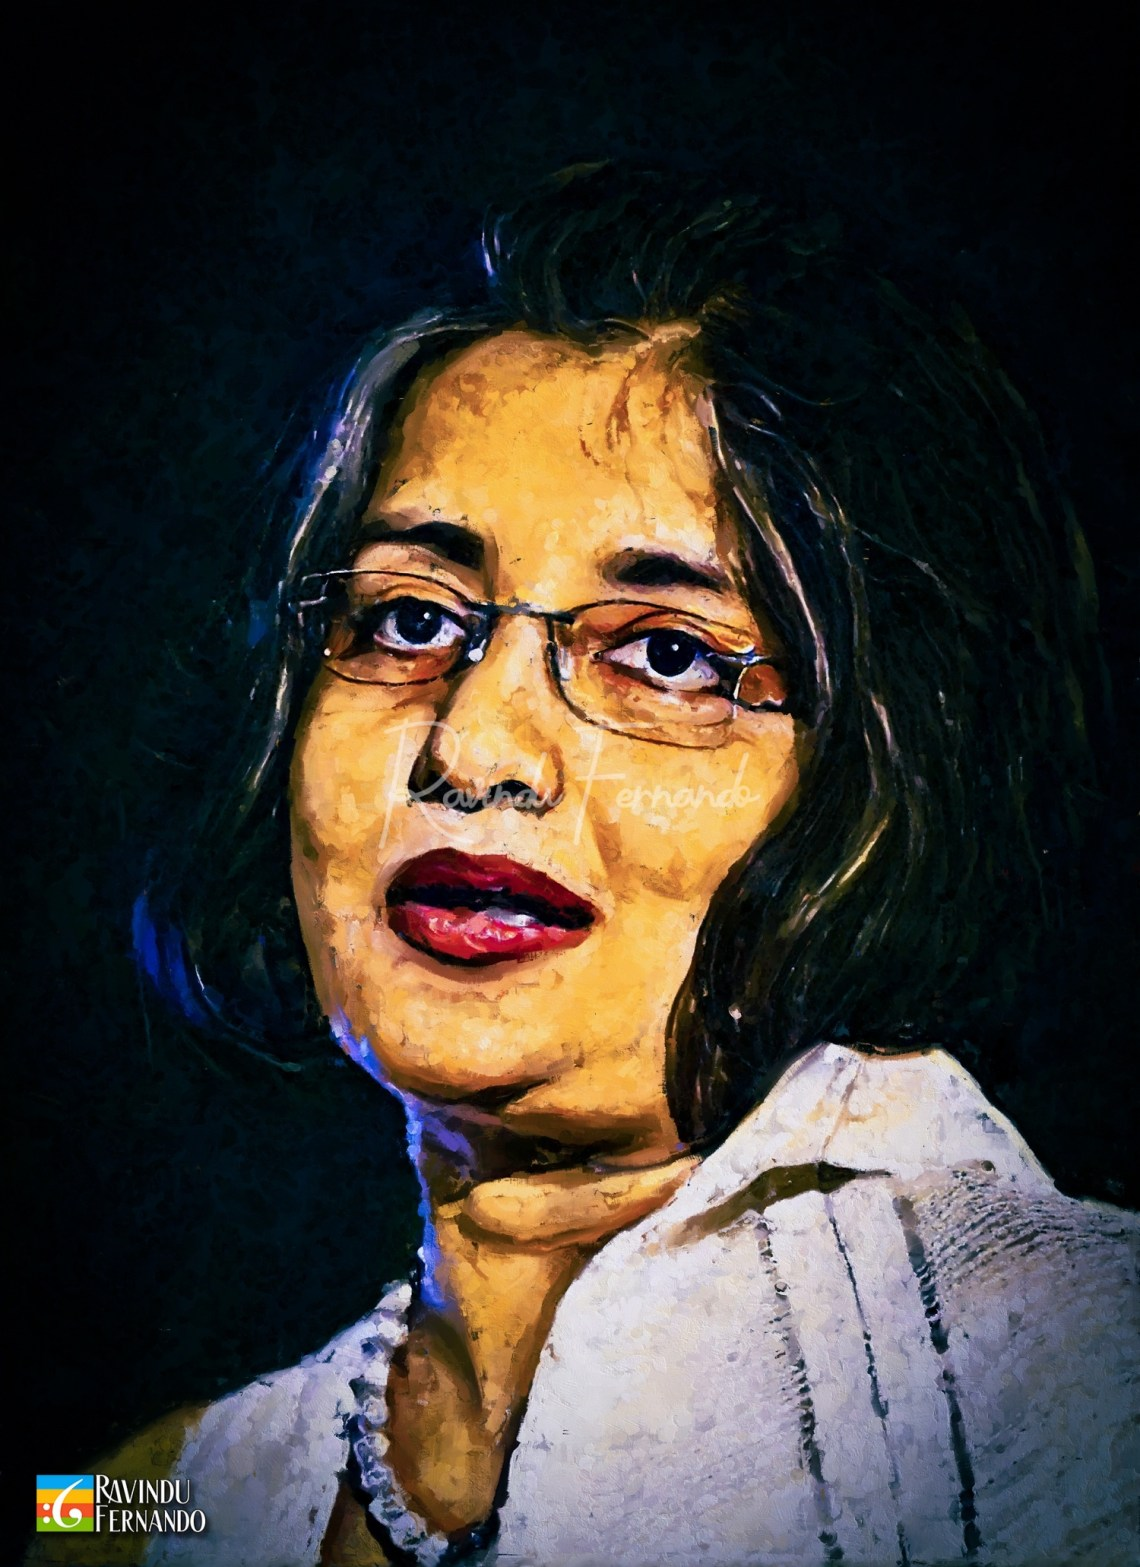 Maithri Wickramasinghe Digital Oil Painting by Ravindu Fernando